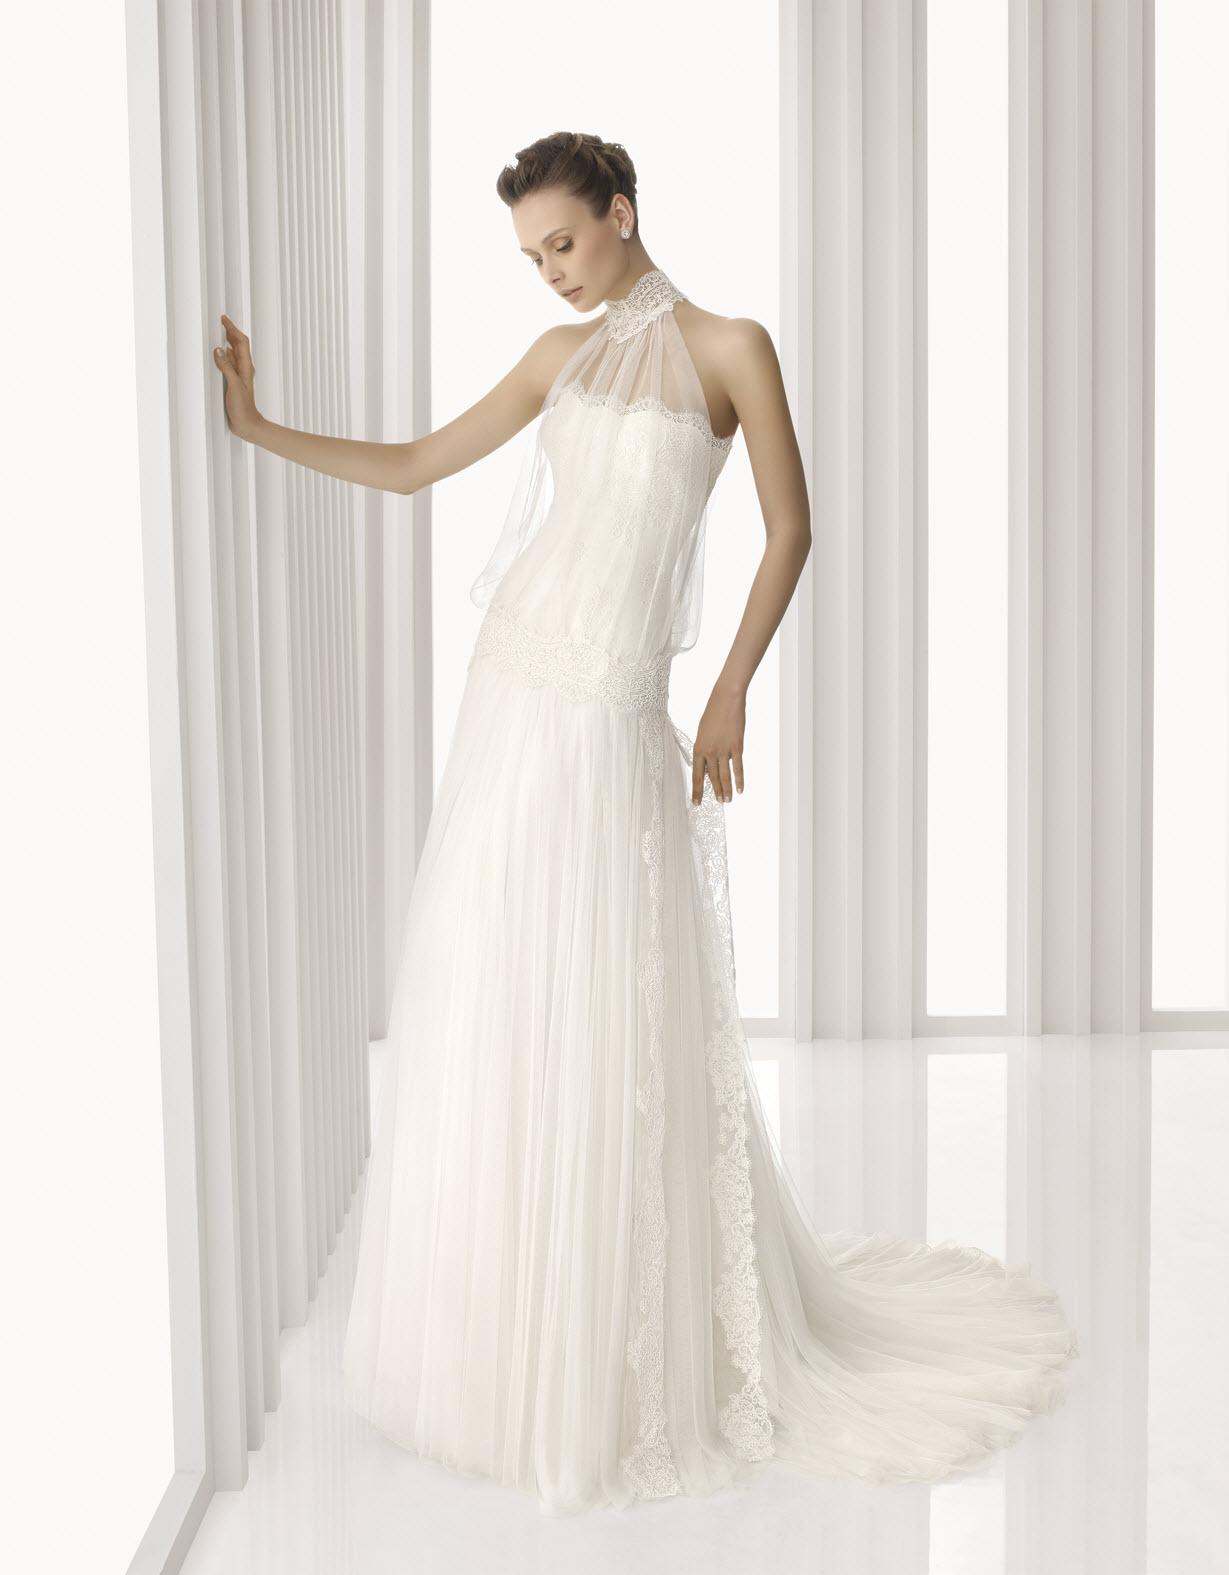 turtleneck wedding dress Wedding lace wro Tulle High Neck Chapel Train A Line Wedding Dress Wro